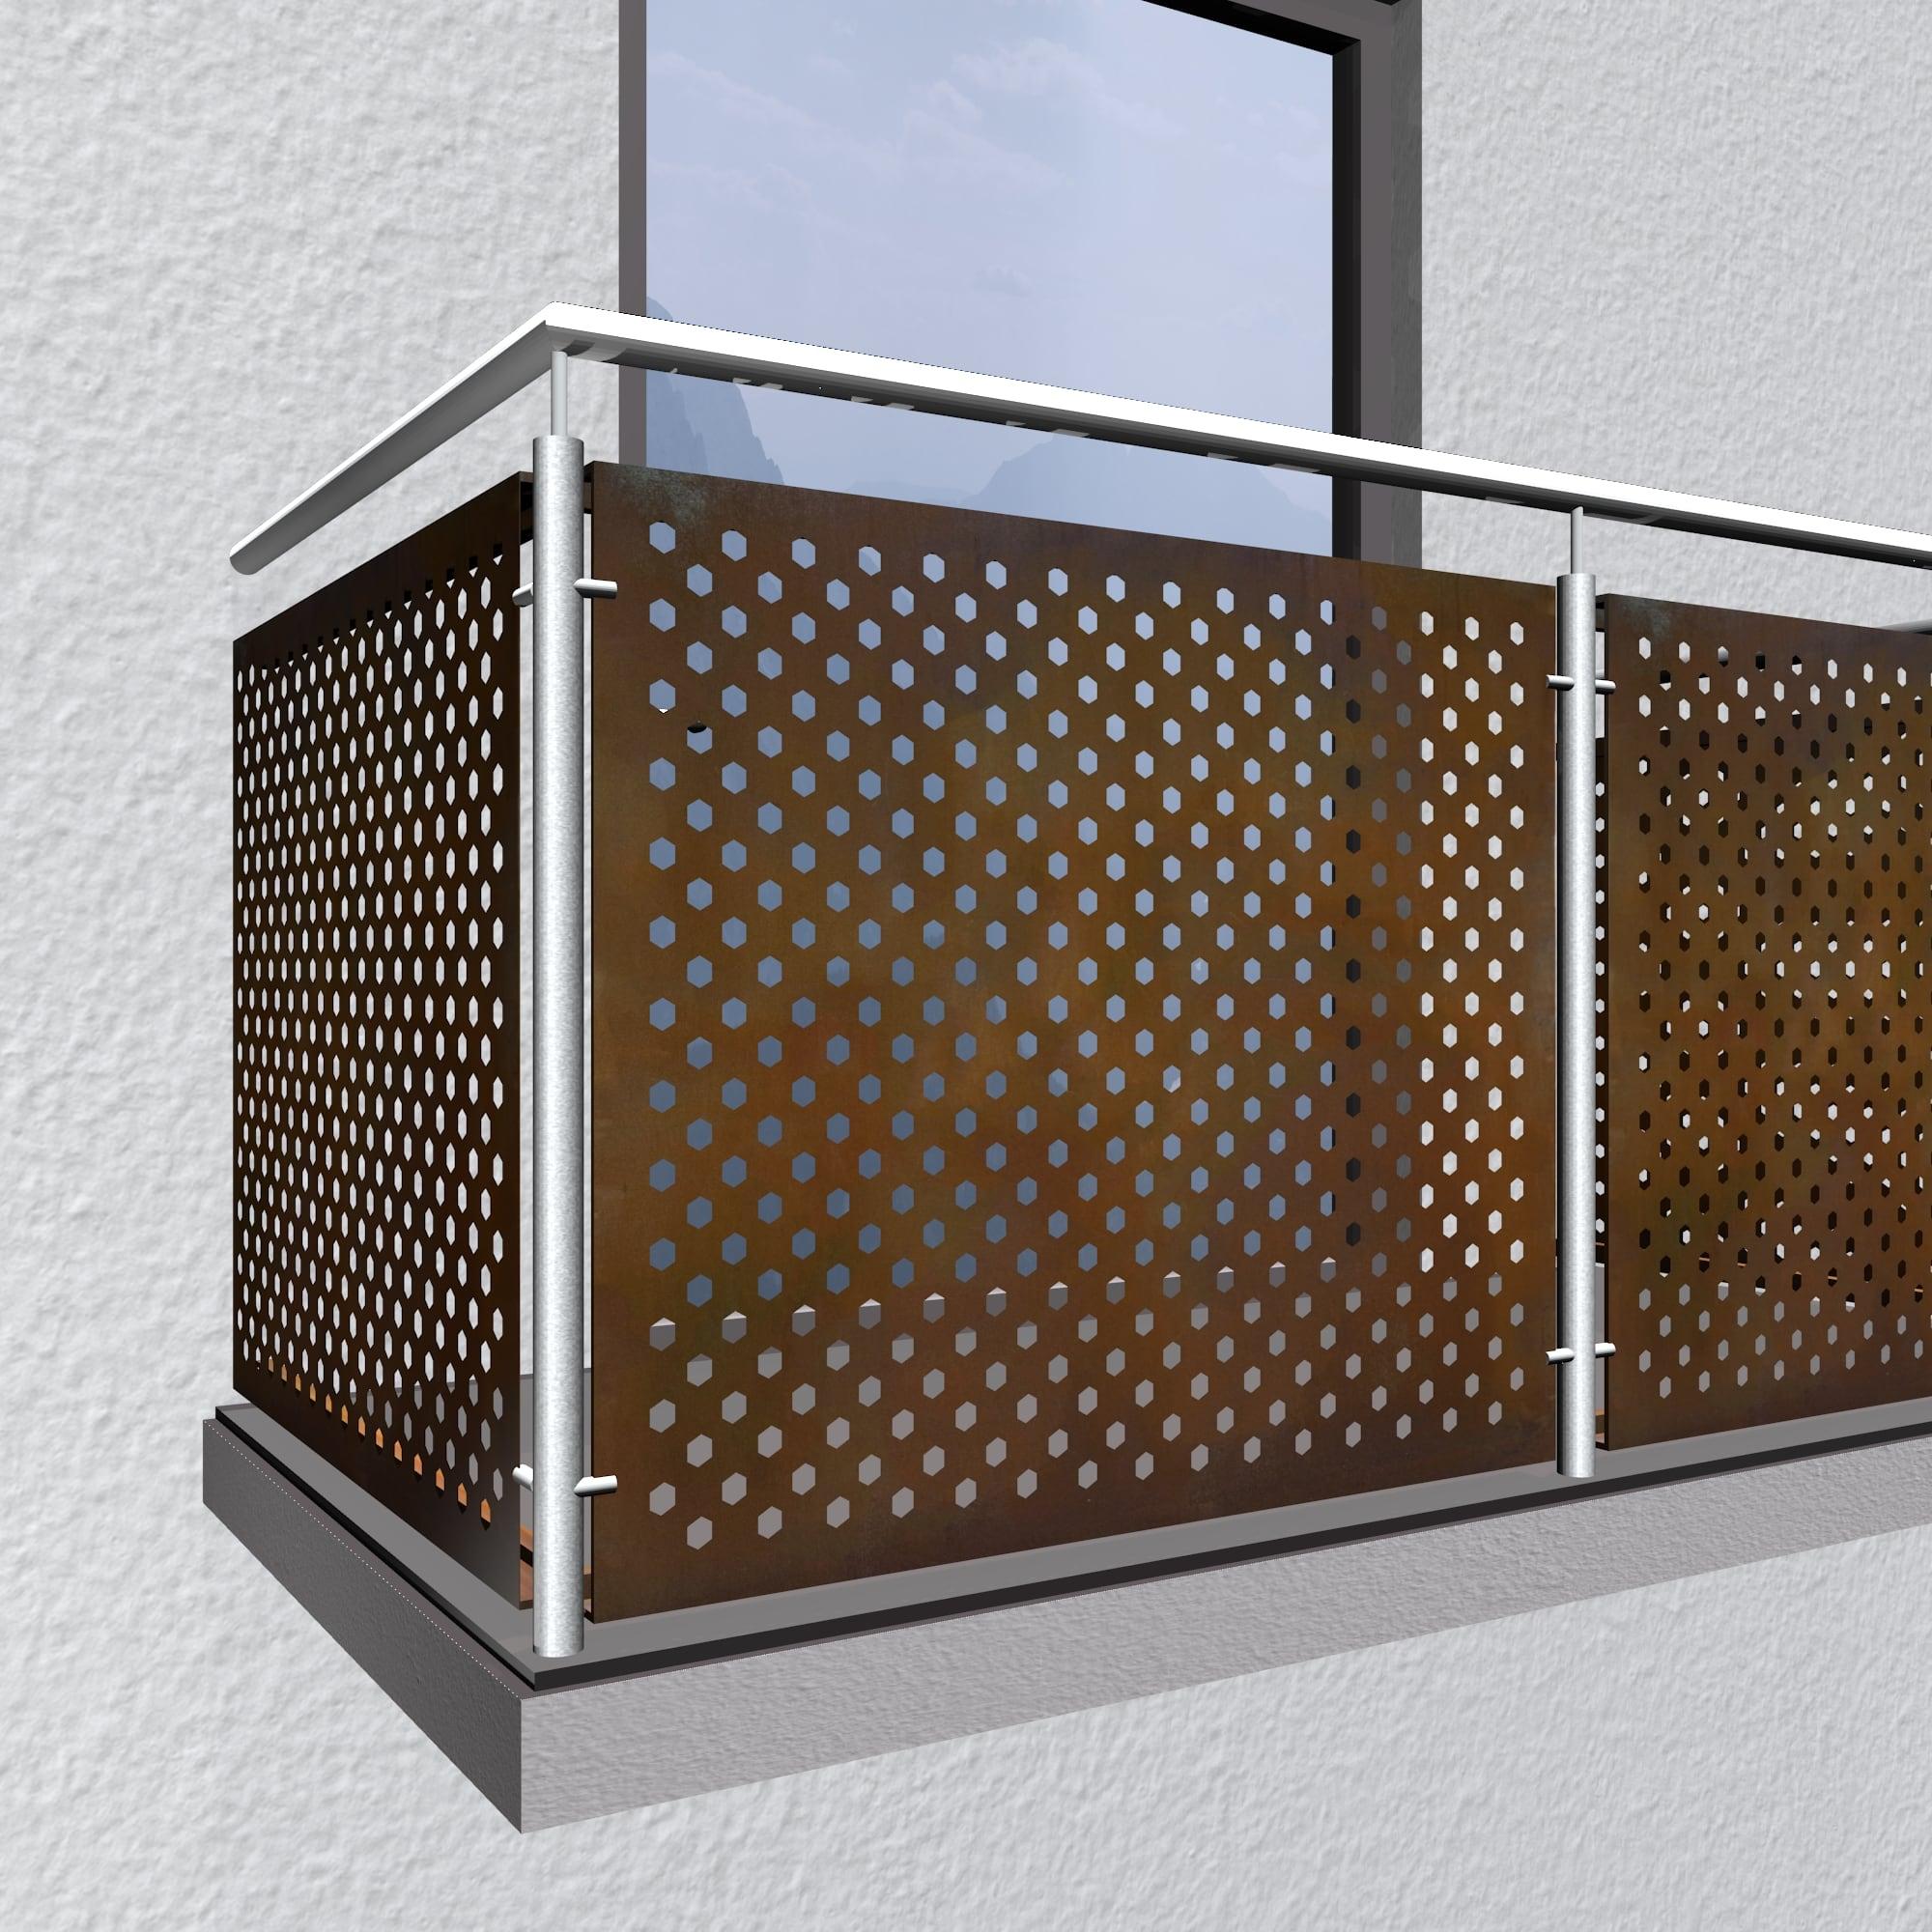 Balkonverkleidung Cortenstahl SK VE